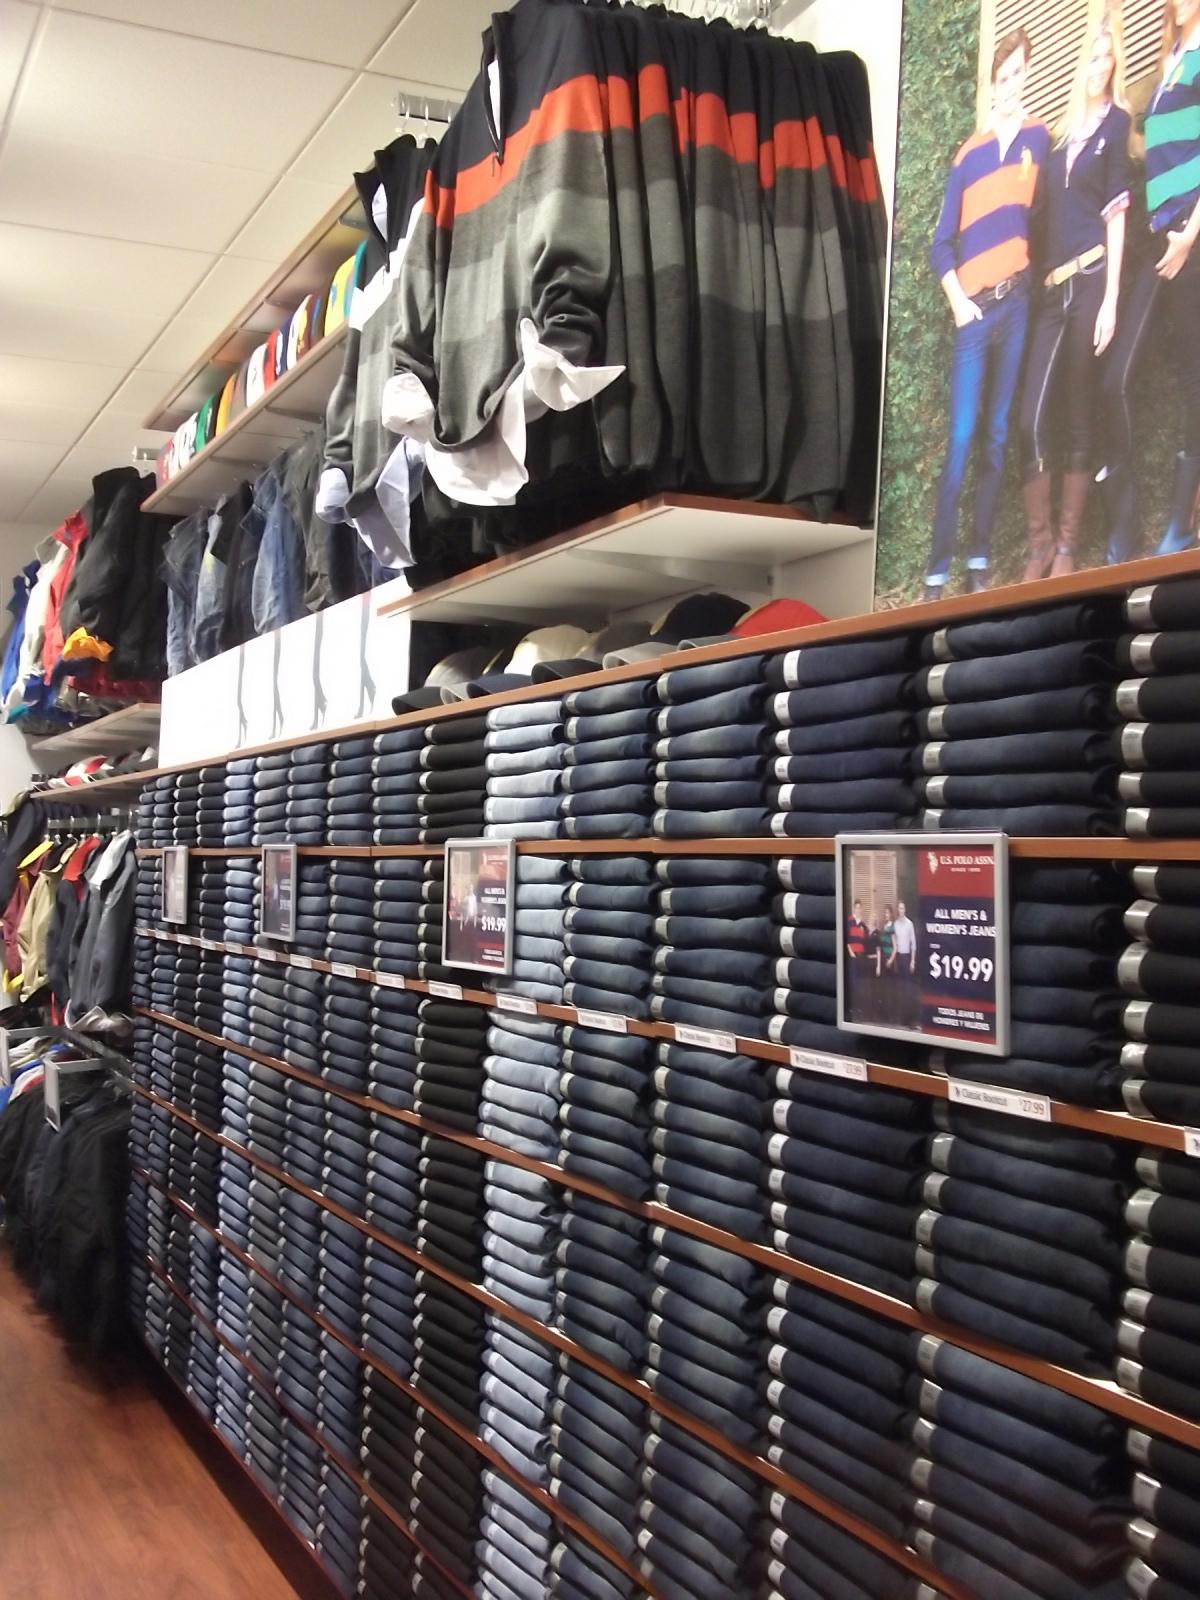 U.S. Polo Assn. Outlet image 2